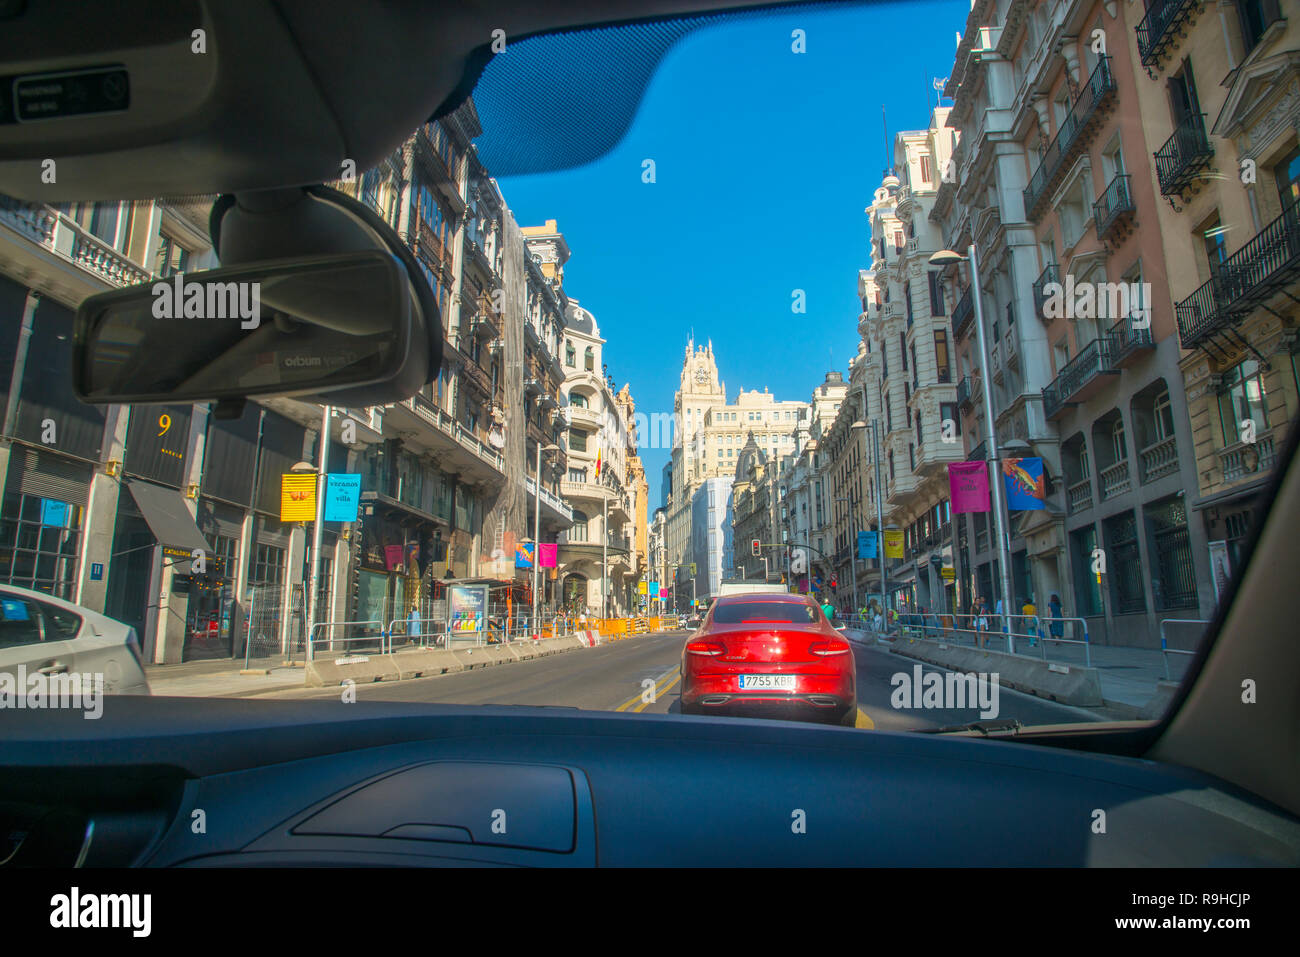 Gran Via street viewed from inside a car. Madrid, Spain. Stock Photo